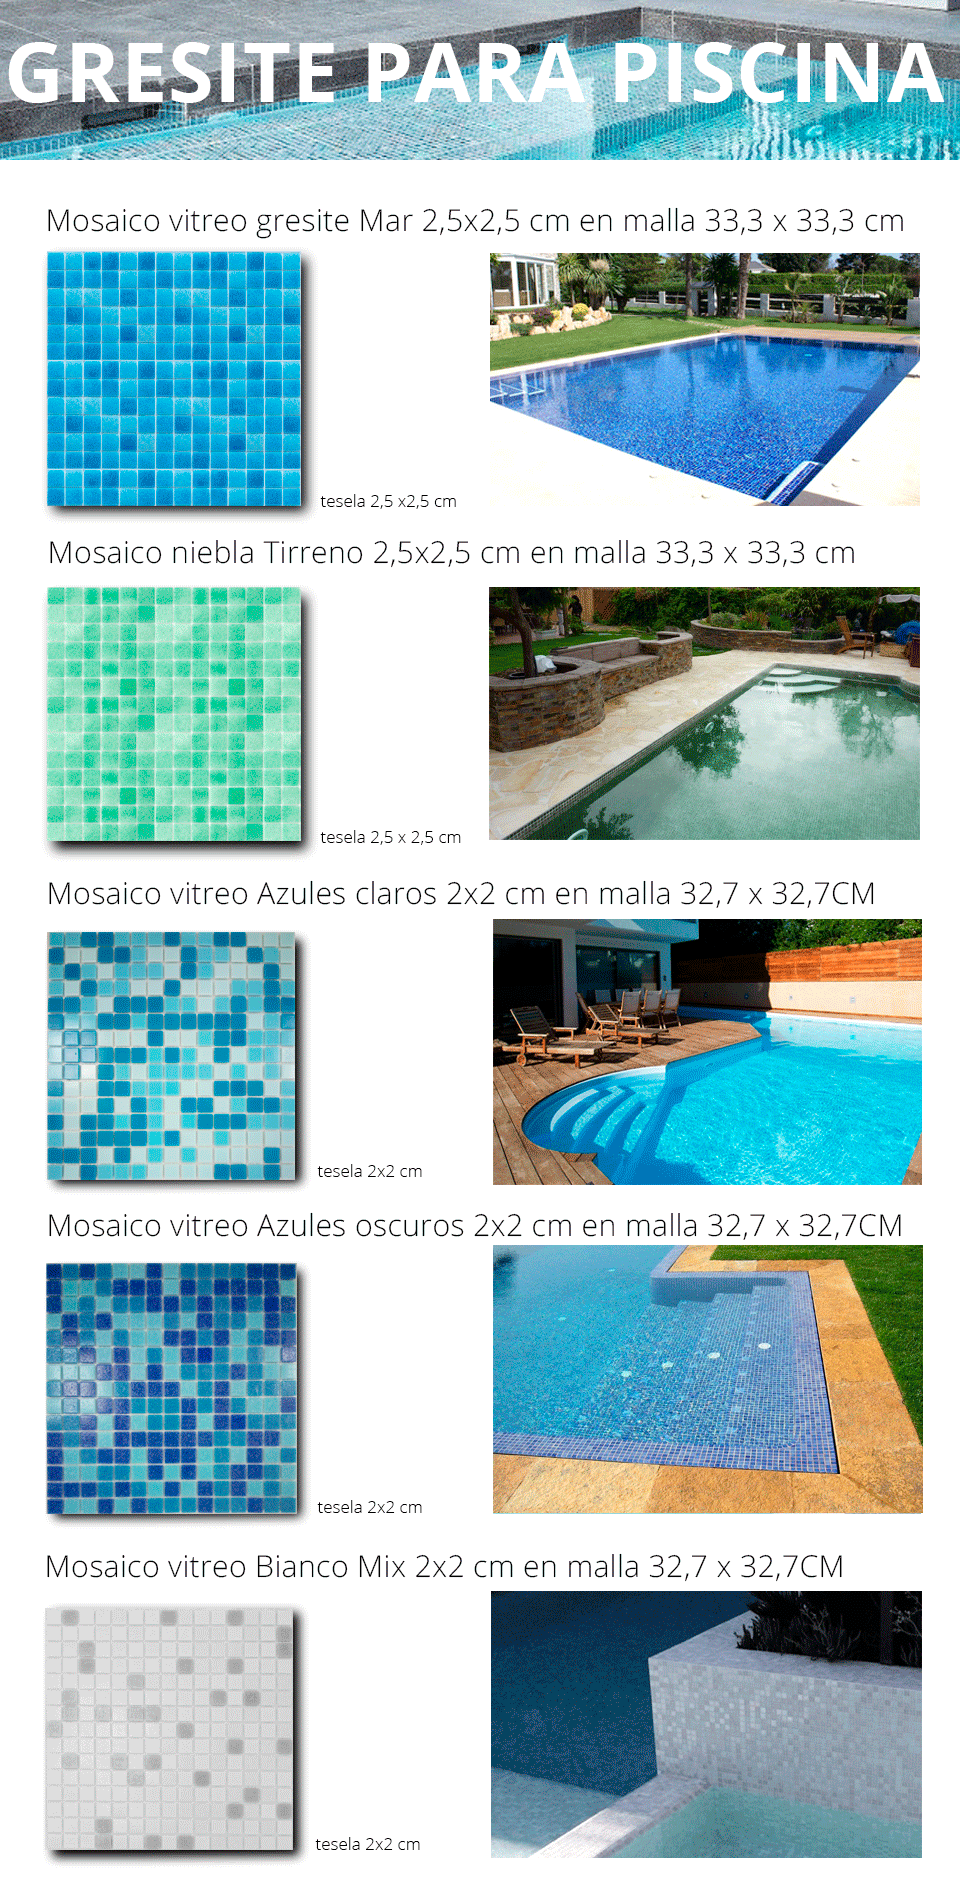 Revestimientos vitreos gresite para piscina o platos de ducha